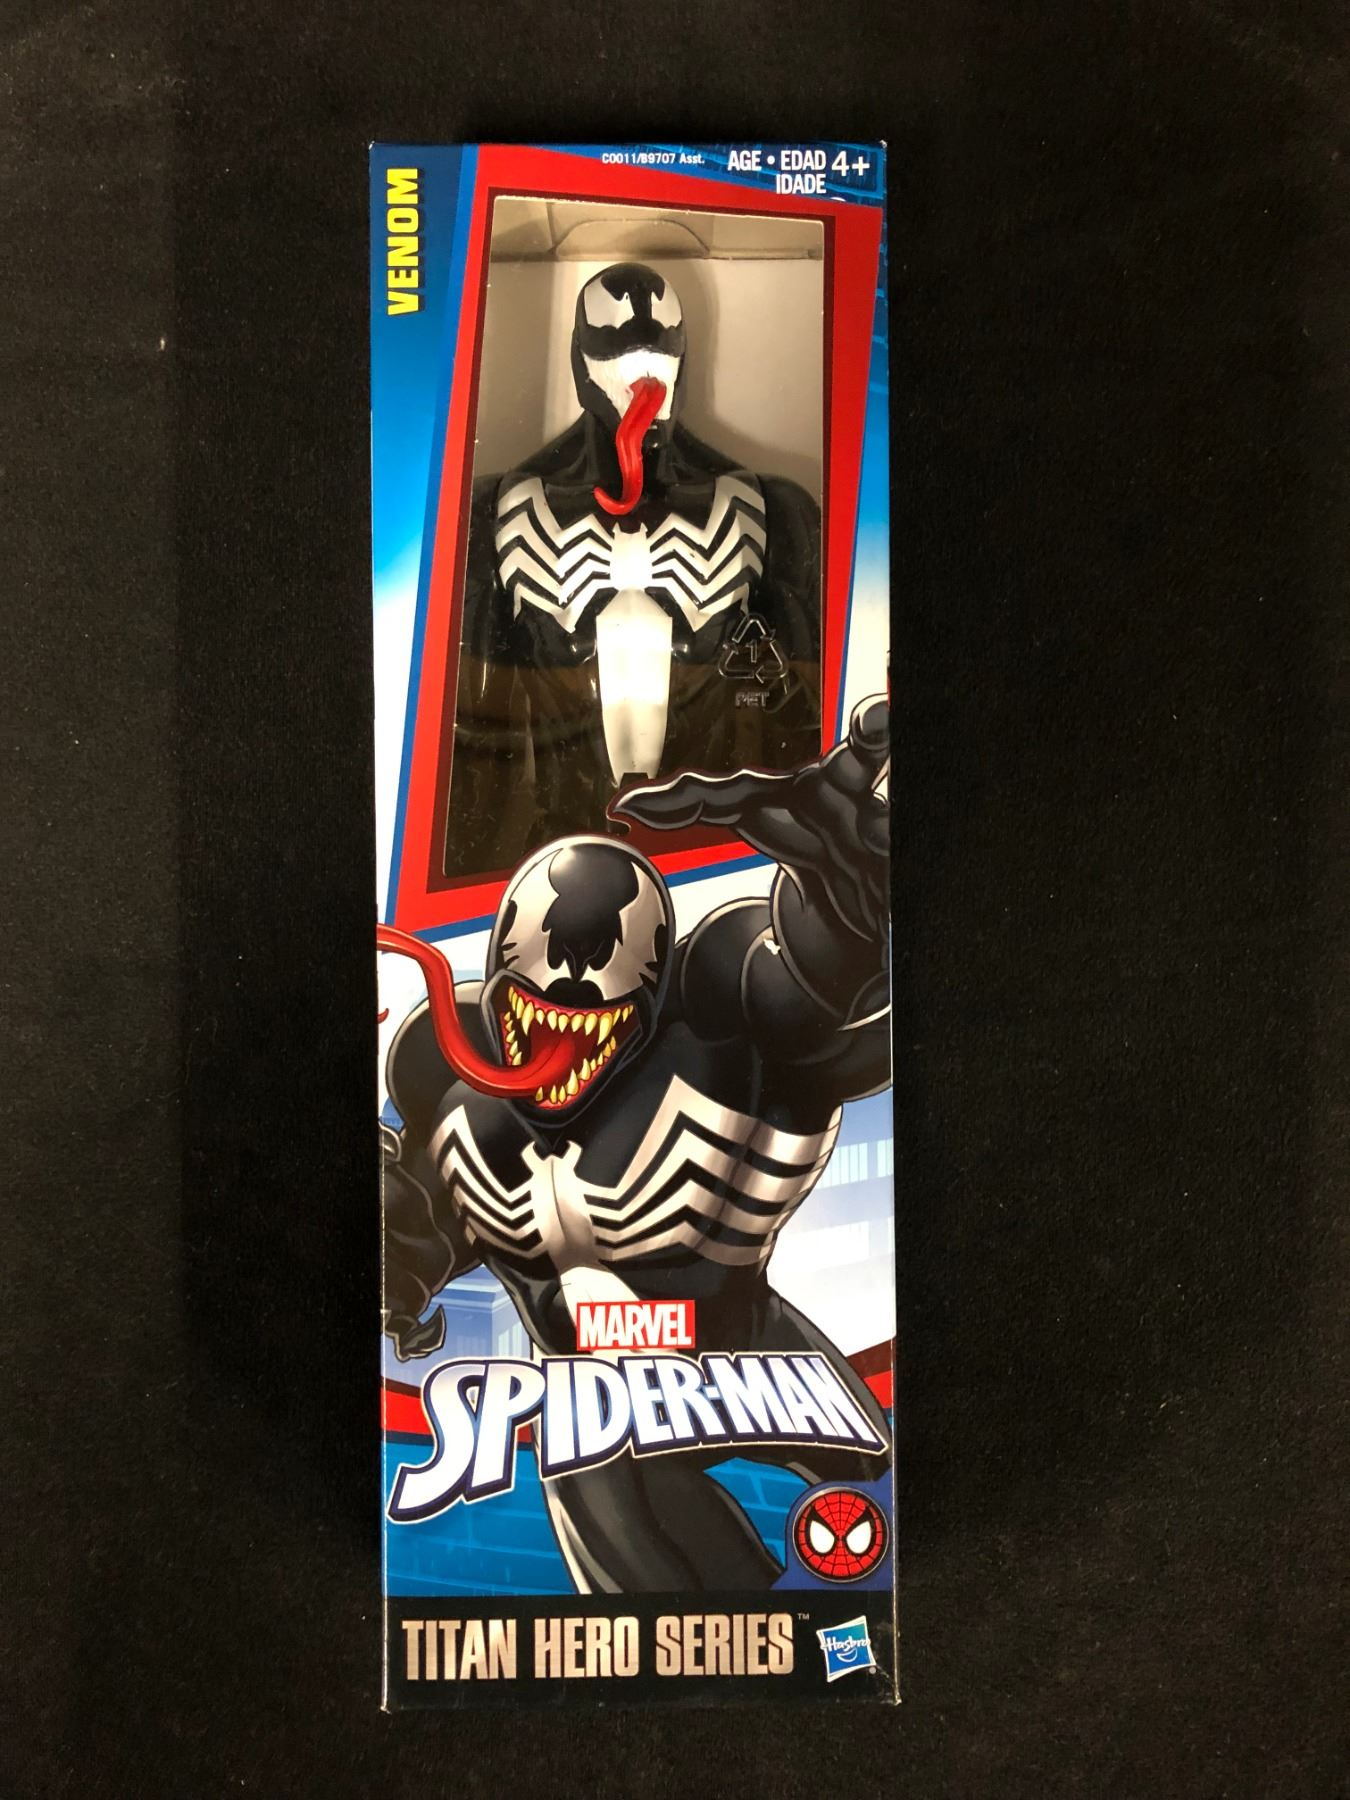 Marvel Venom Spider-Man Titan Hero Series Action Figure